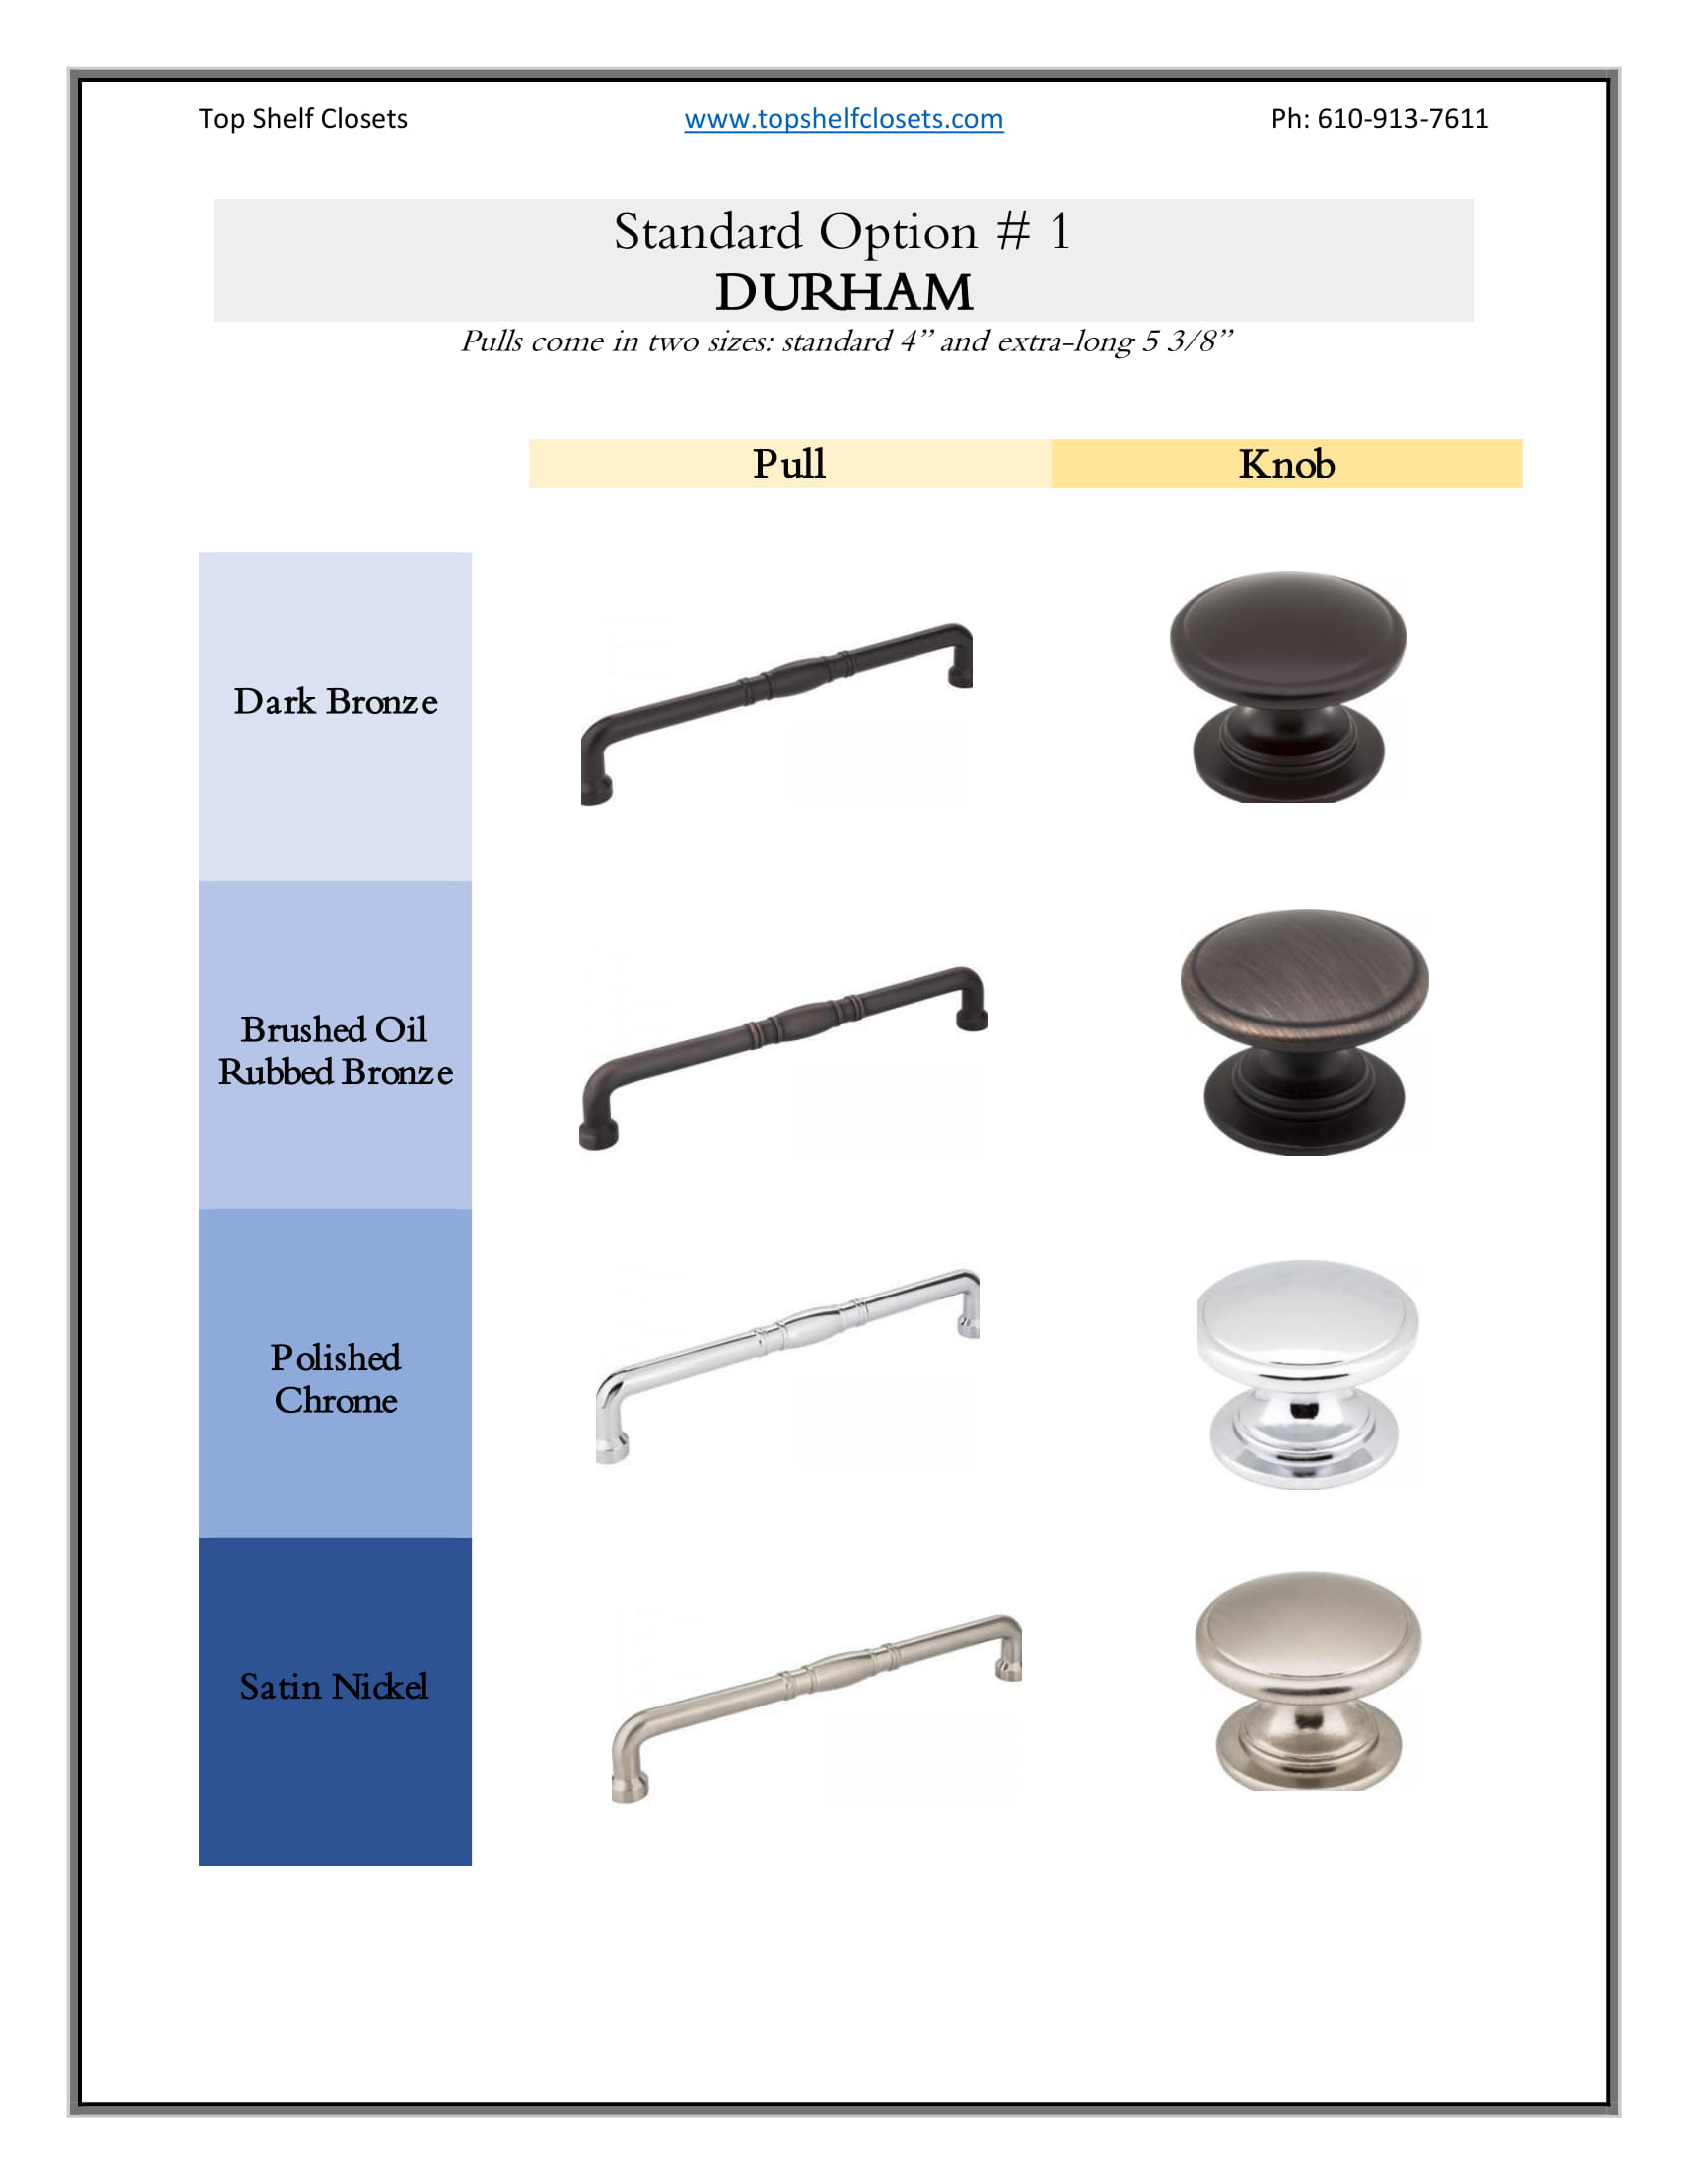 Pull & Knob | Top Shelf Closets